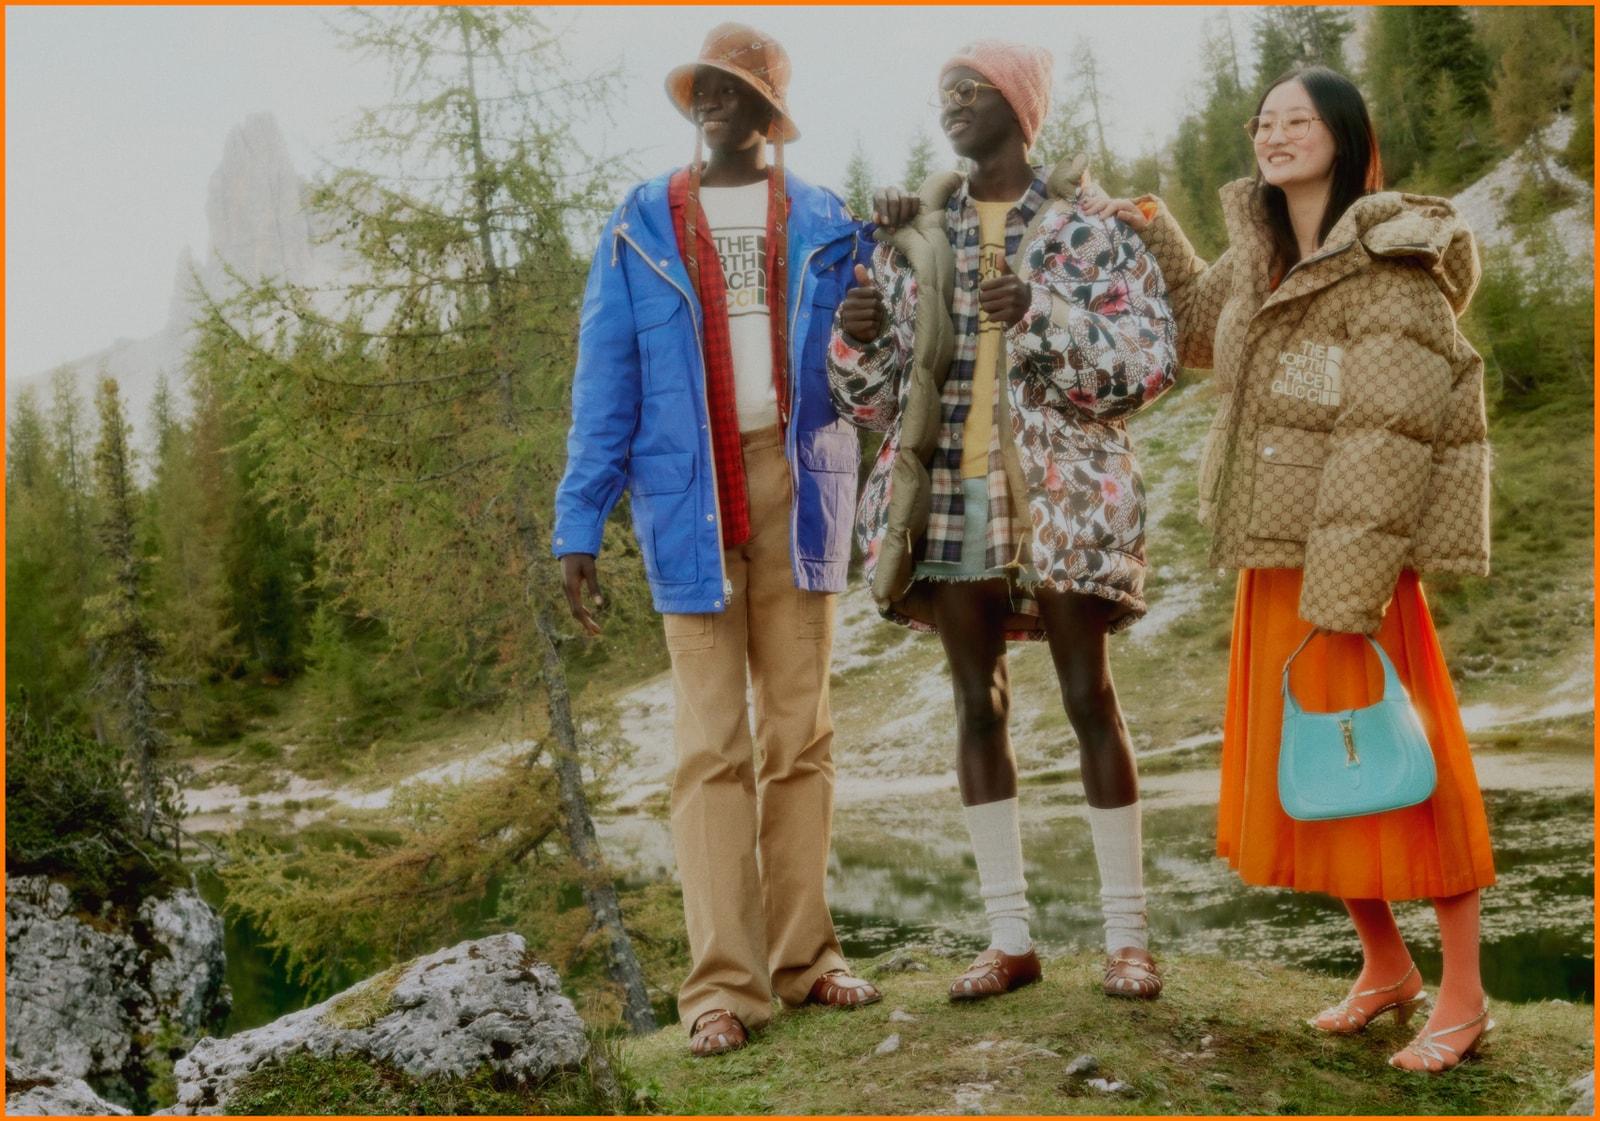 目不暇給 - 搶先預覽 The North Face x Gucci 聯乘系列單品